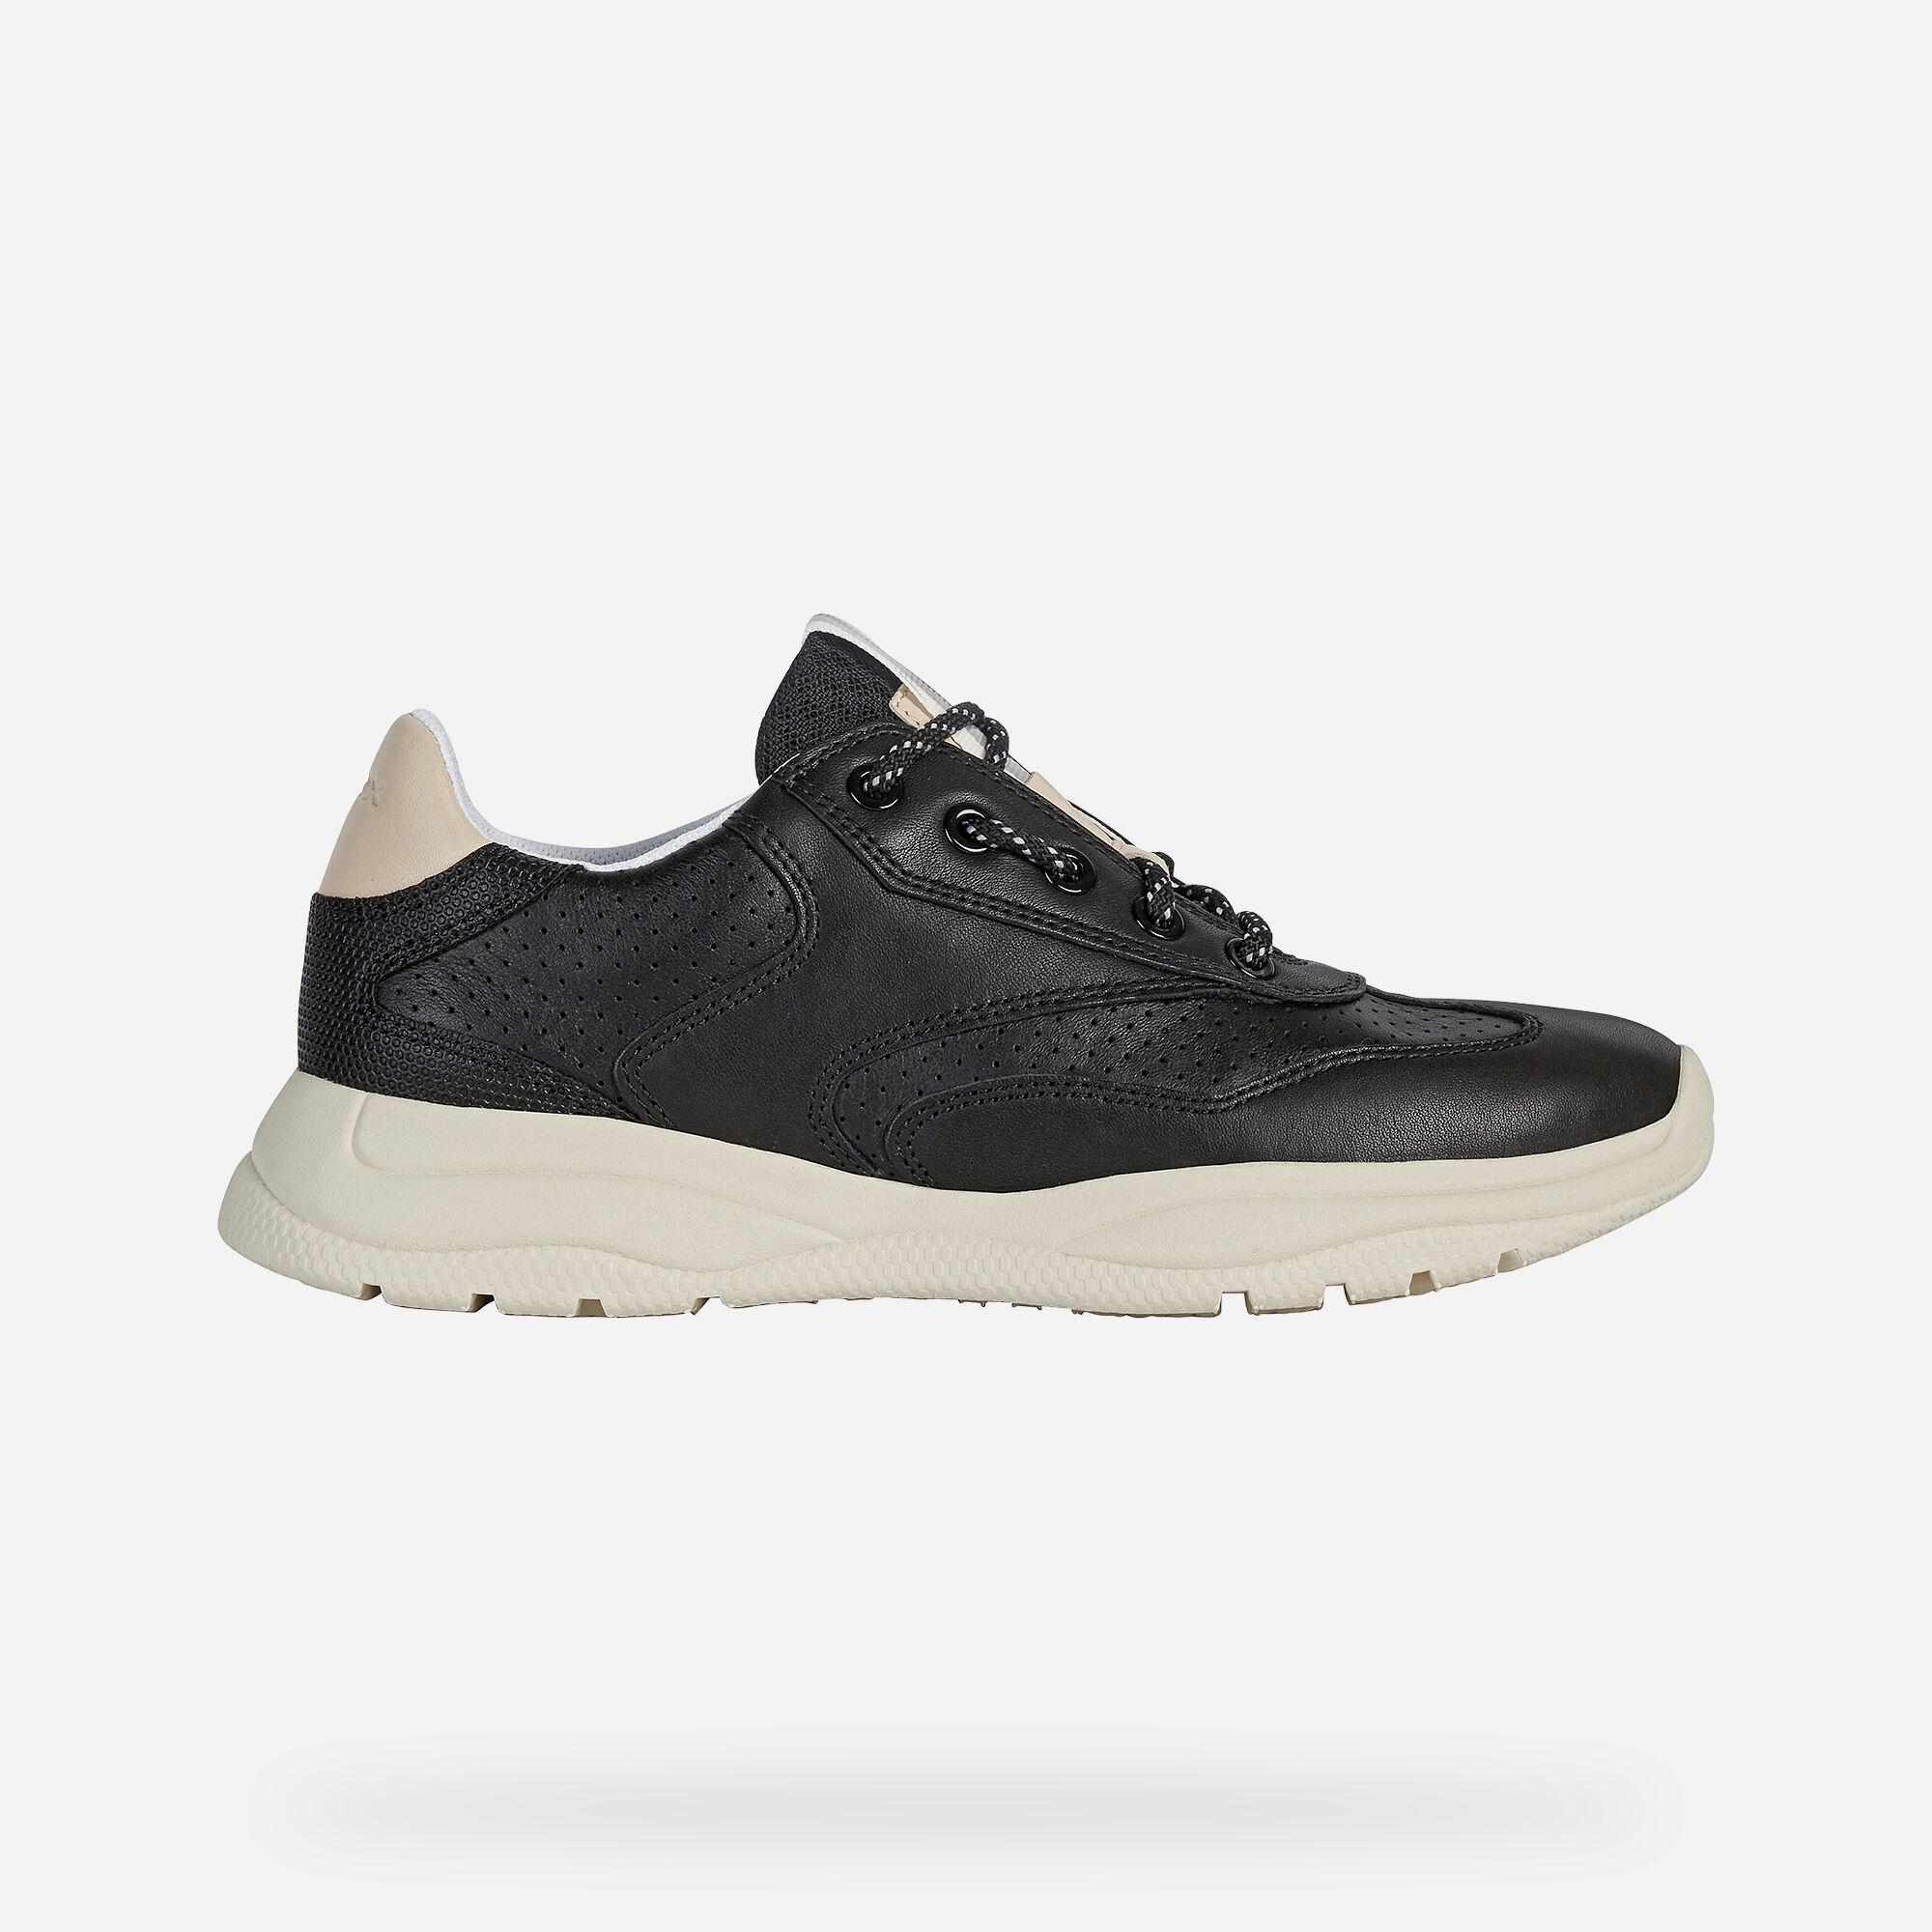 Geox SMERALDO Donna: Sneakers Nere   Geox ®